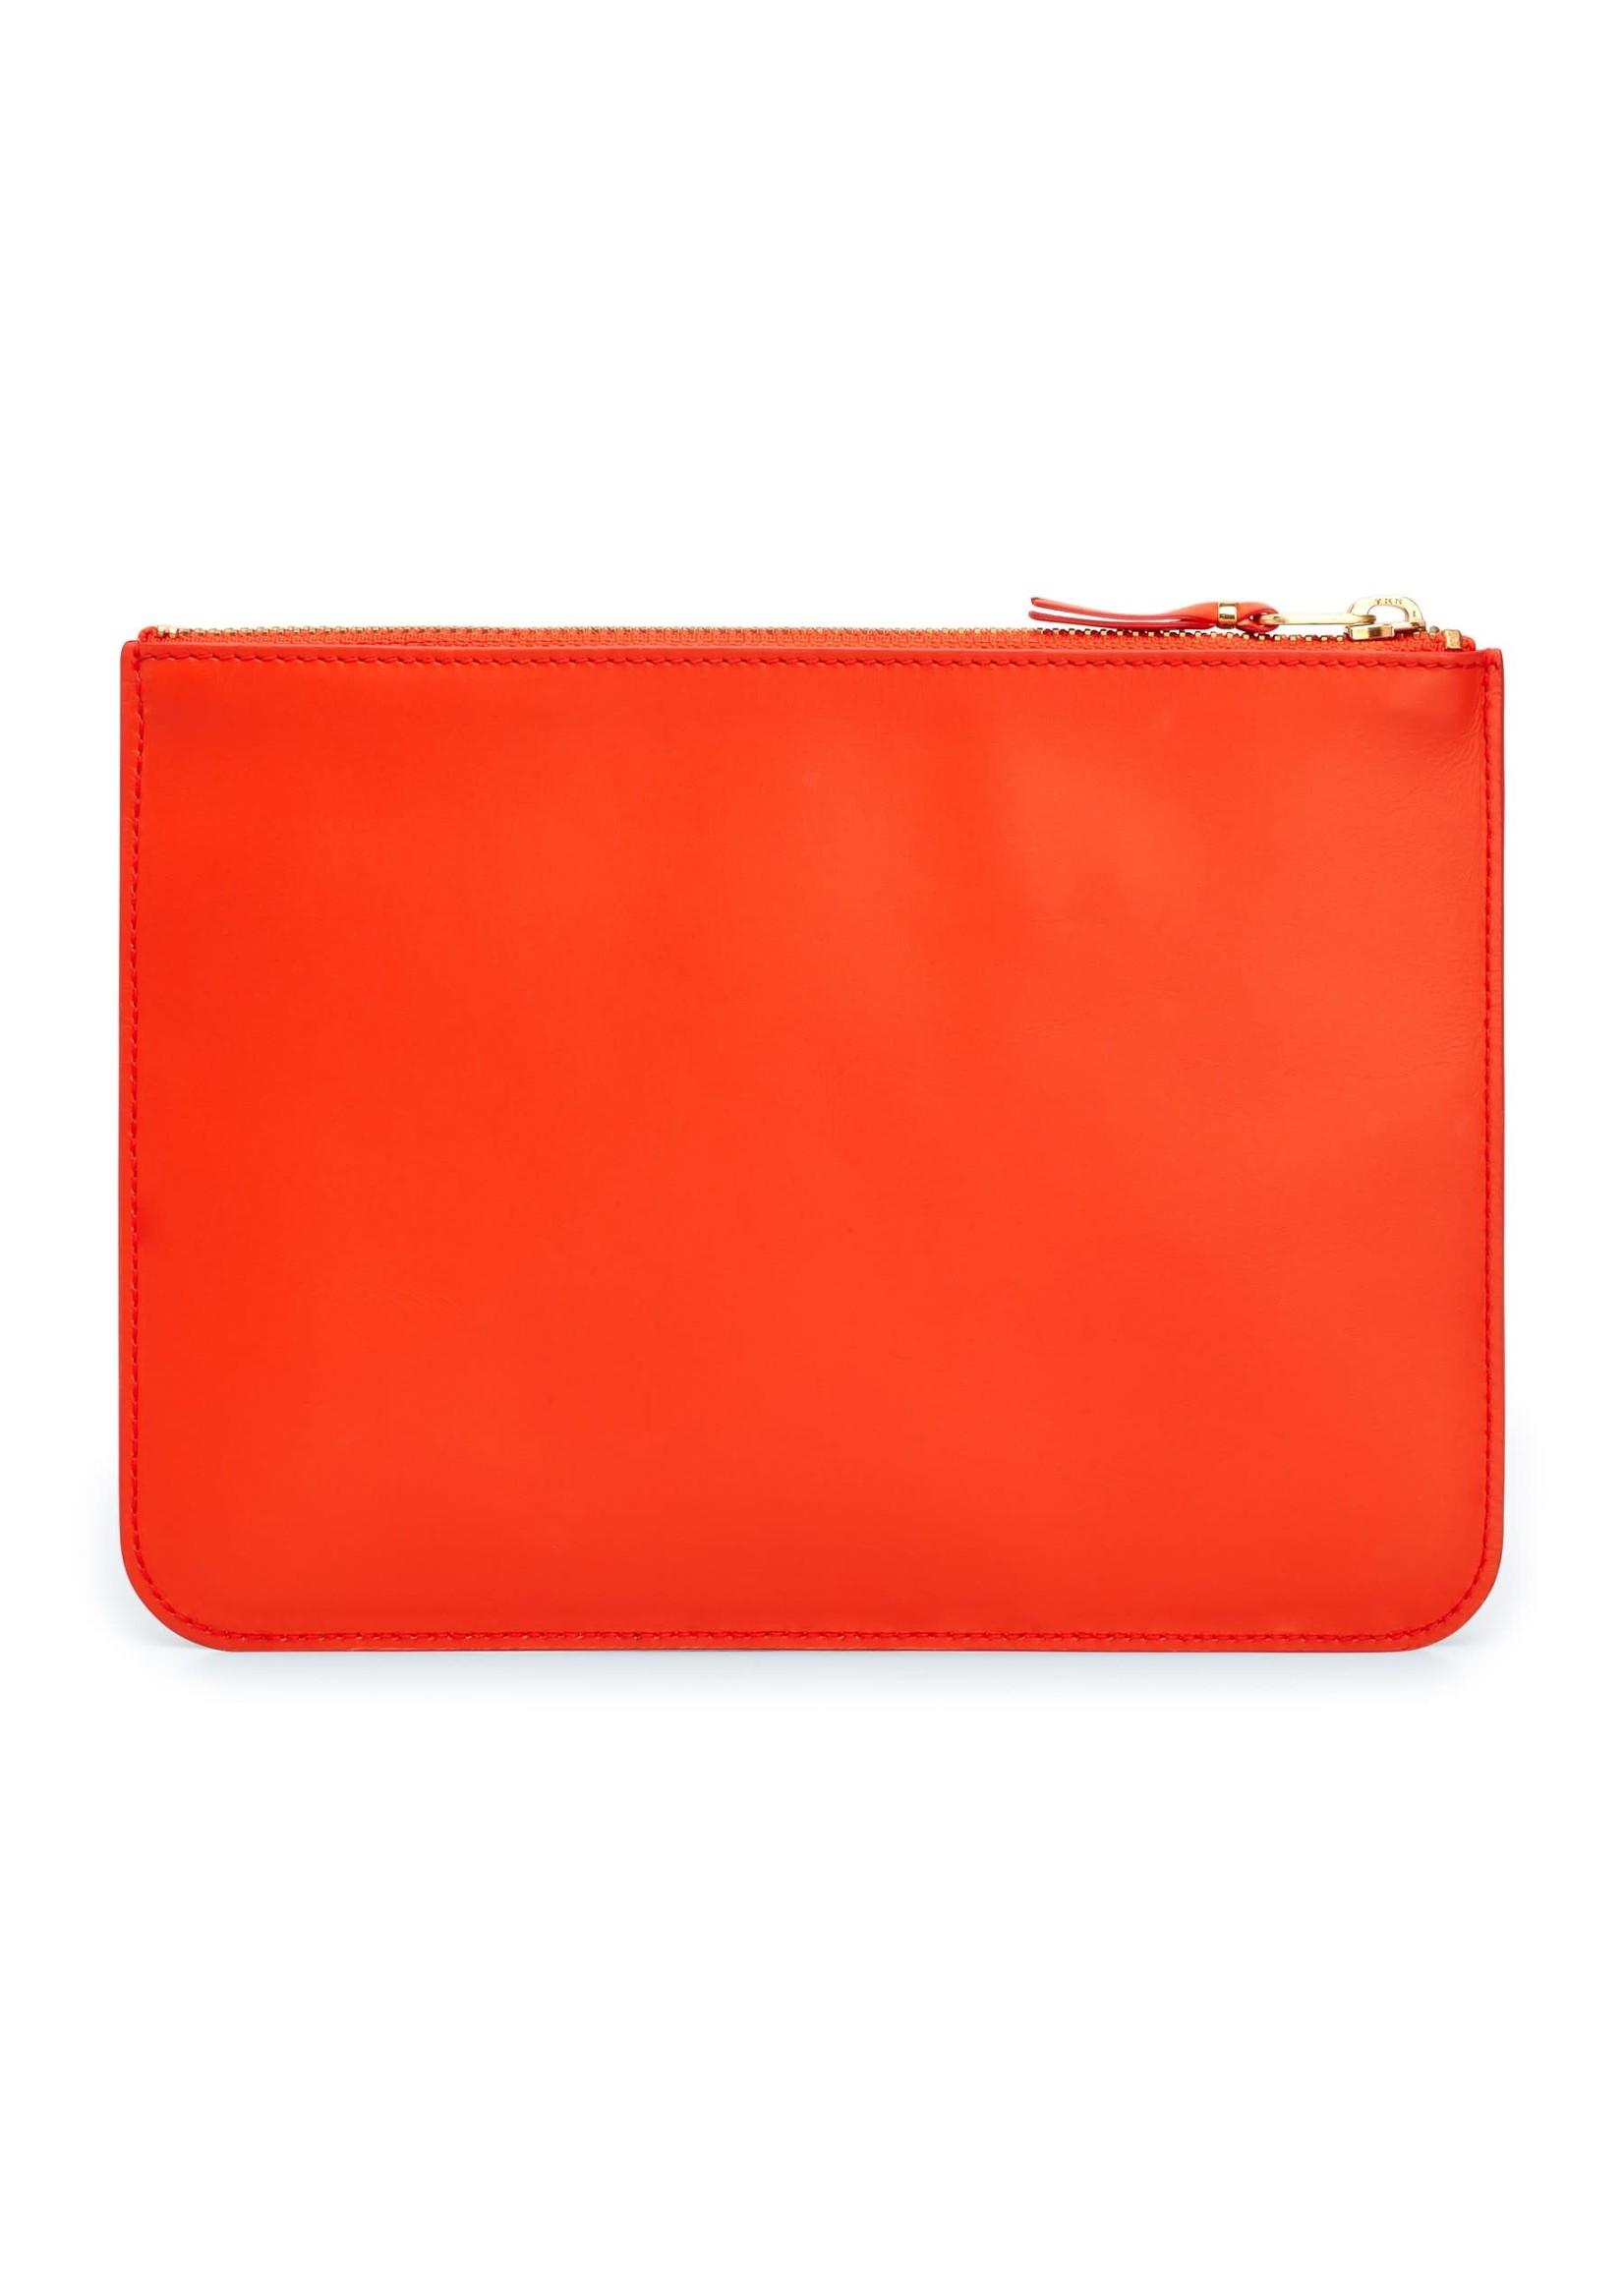 COMME des GARÇONS WALLET Large zip pouch in Orange Ruby Eyed Snake